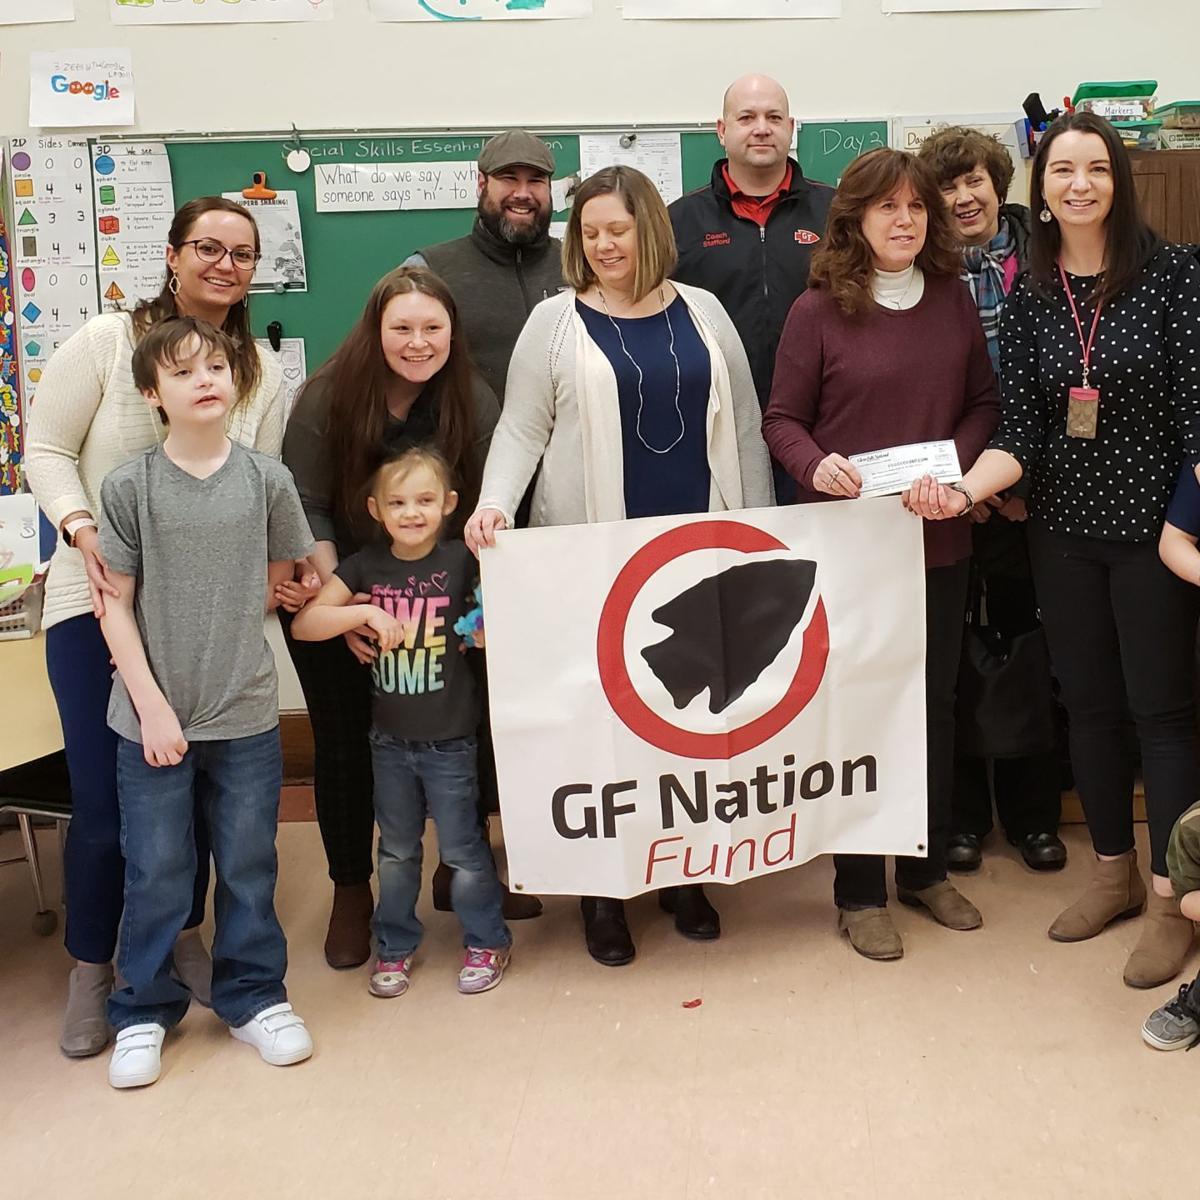 GF Nation presents grant